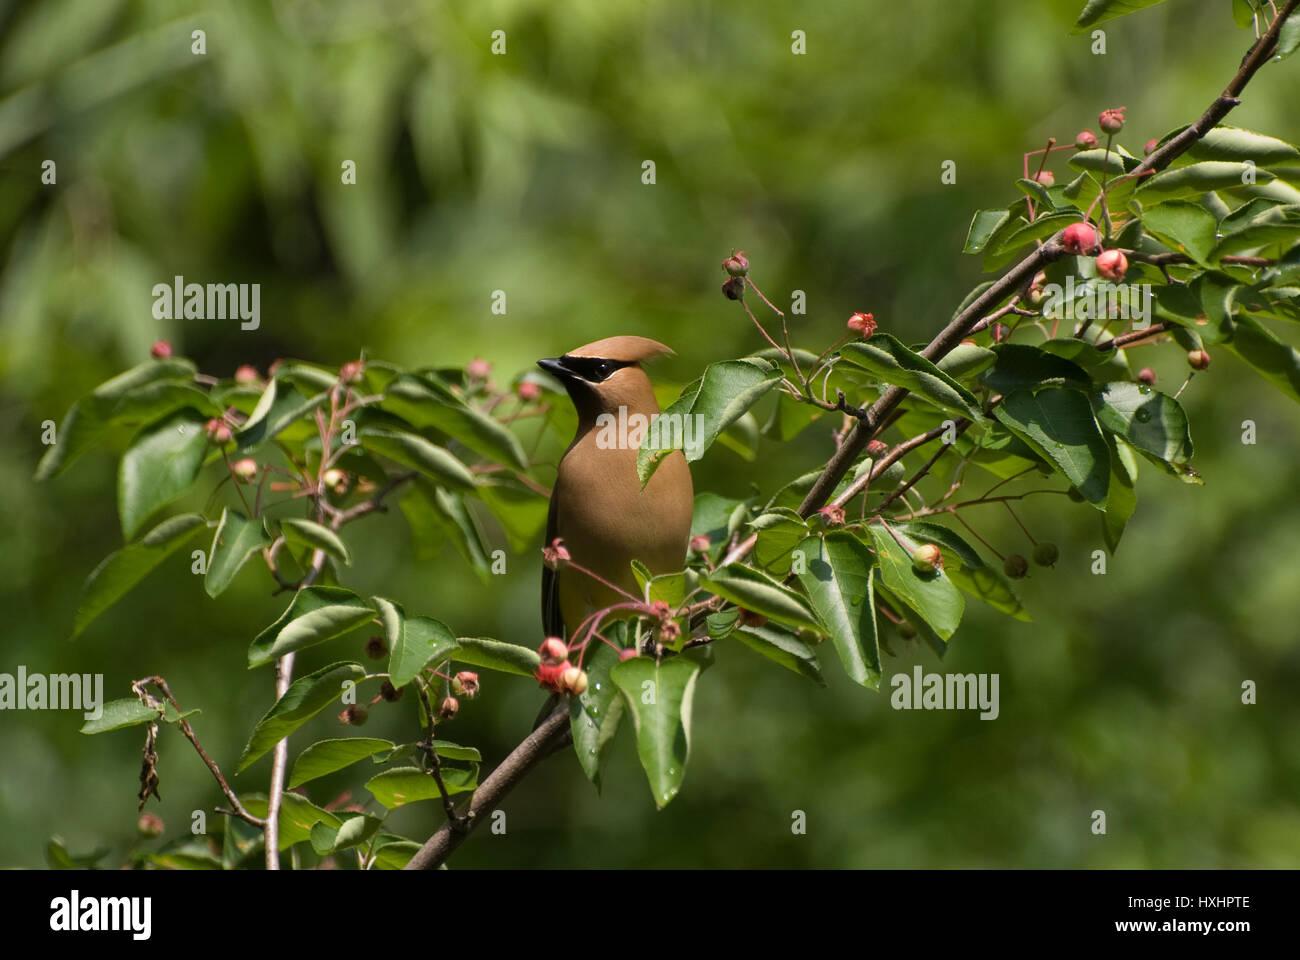 Un Cedar Waxwing Bombycilla cedrorum () encaramado en un árbol Serviceberry. Imagen De Stock